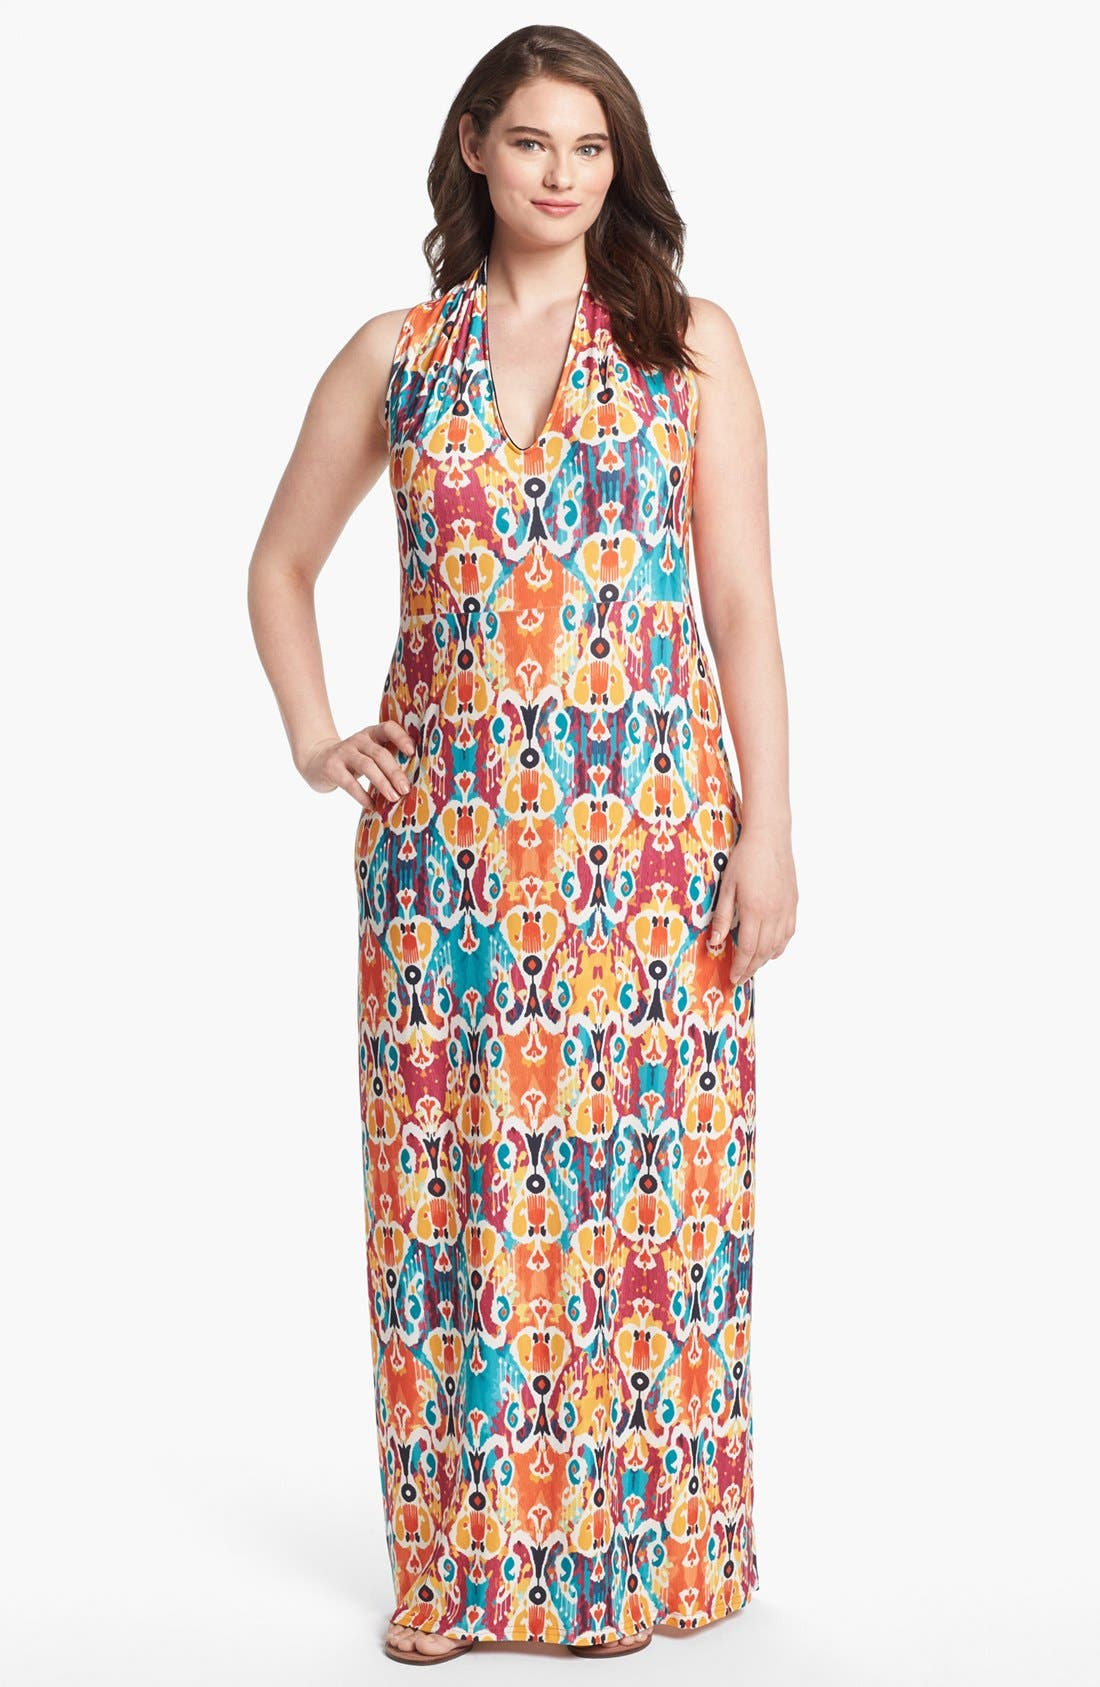 Alternate Image 1 Selected - Viereck 'Vendome' Print Maxi Dress (Plus Size)